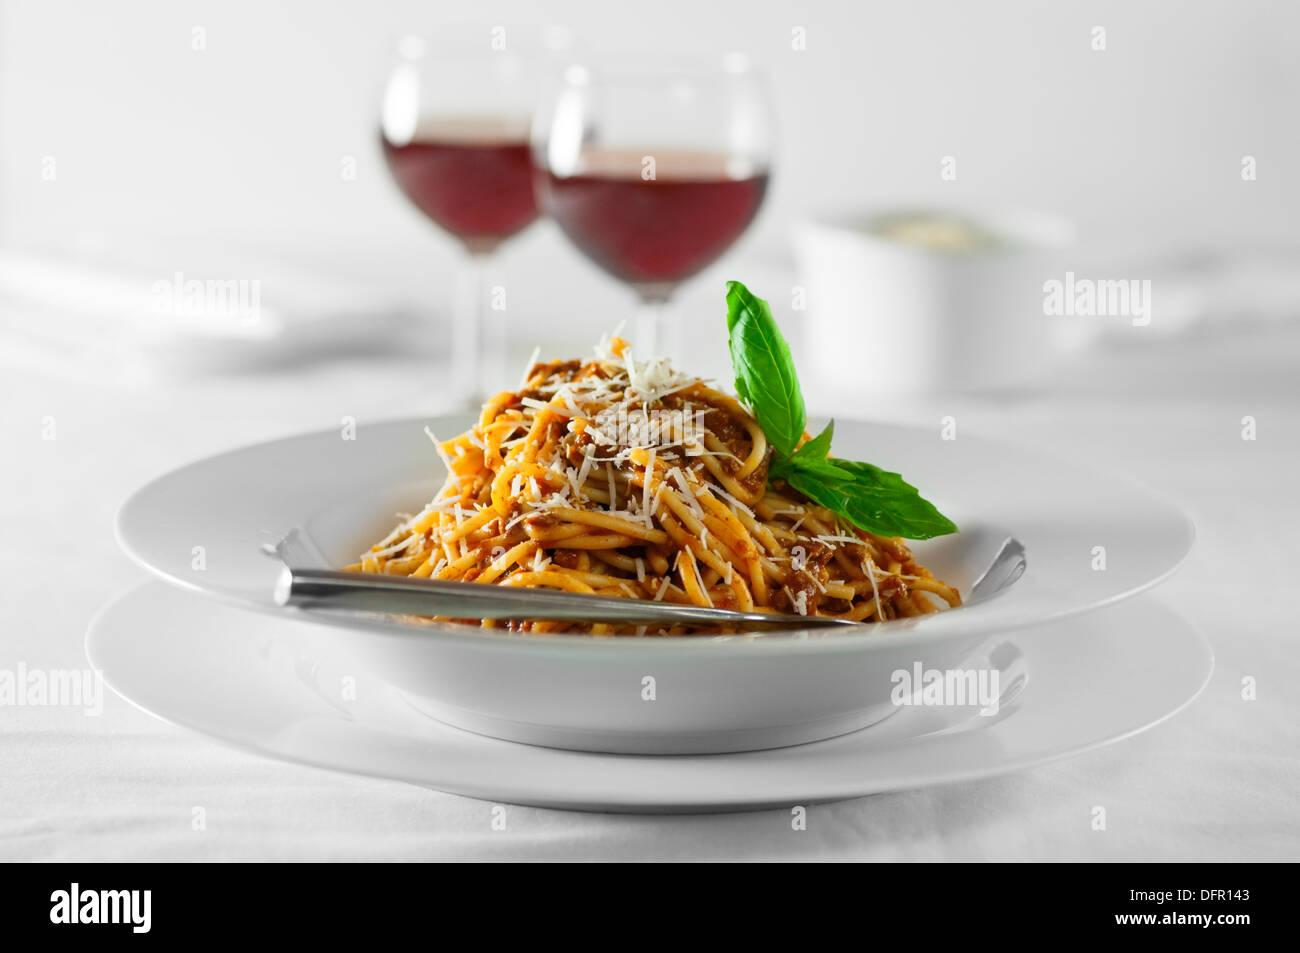 Los espaguetis a la boloñesa comida italiana Imagen De Stock